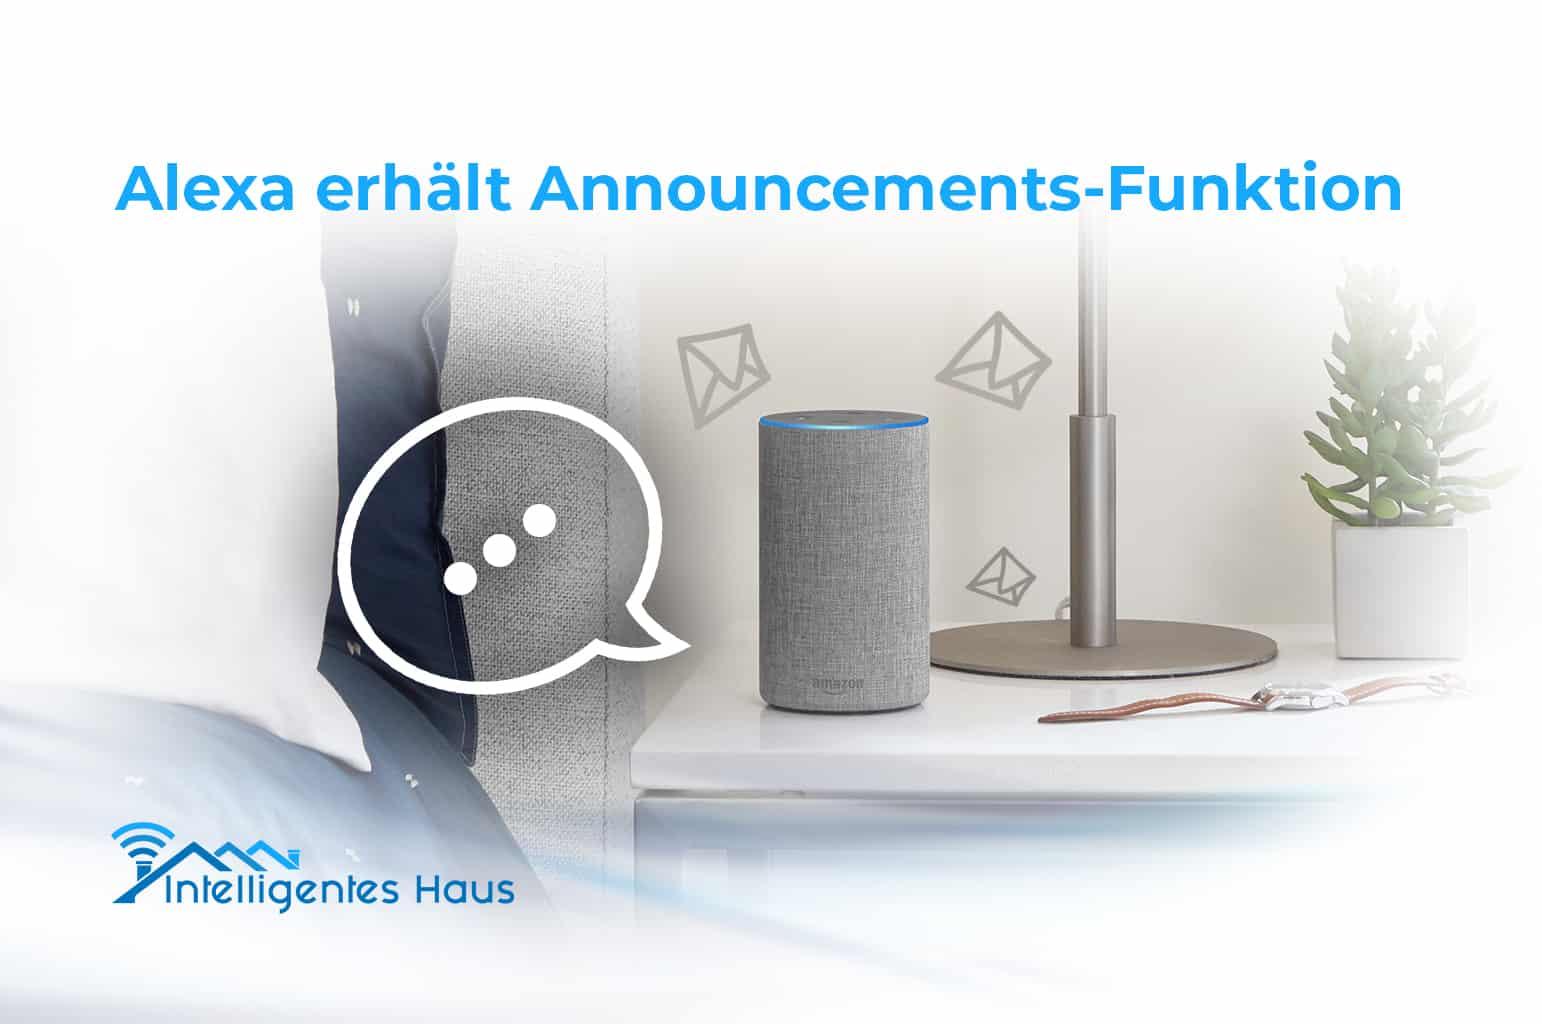 neue funktion alexa bietet nun echo announcements. Black Bedroom Furniture Sets. Home Design Ideas